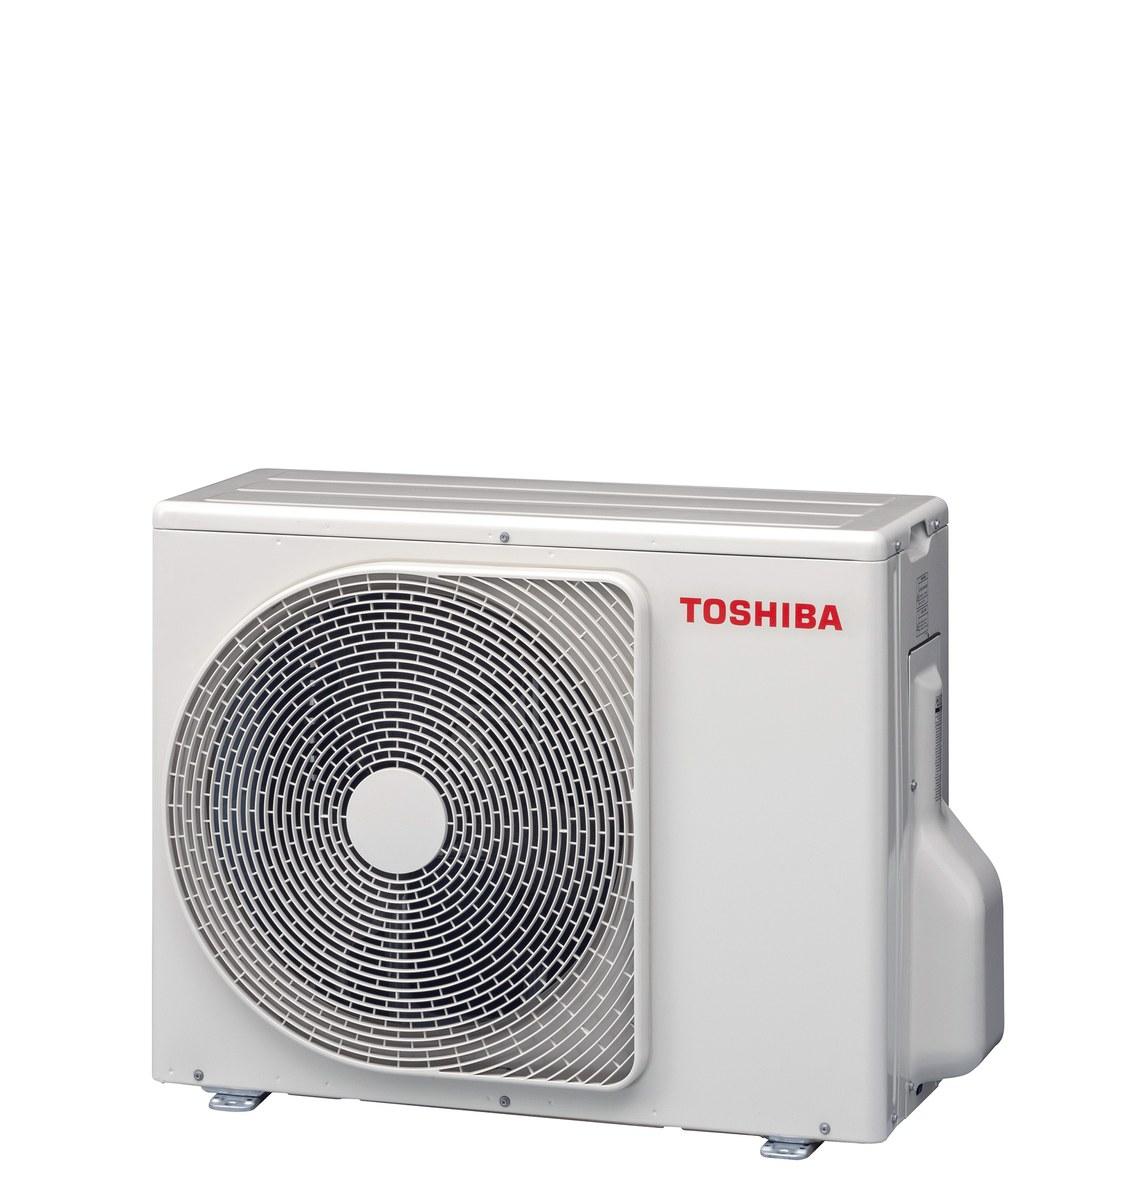 https://www.toshiba-aircon.co.uk/wp-content/uploads/2012/07/estia_40_cdu.jpg